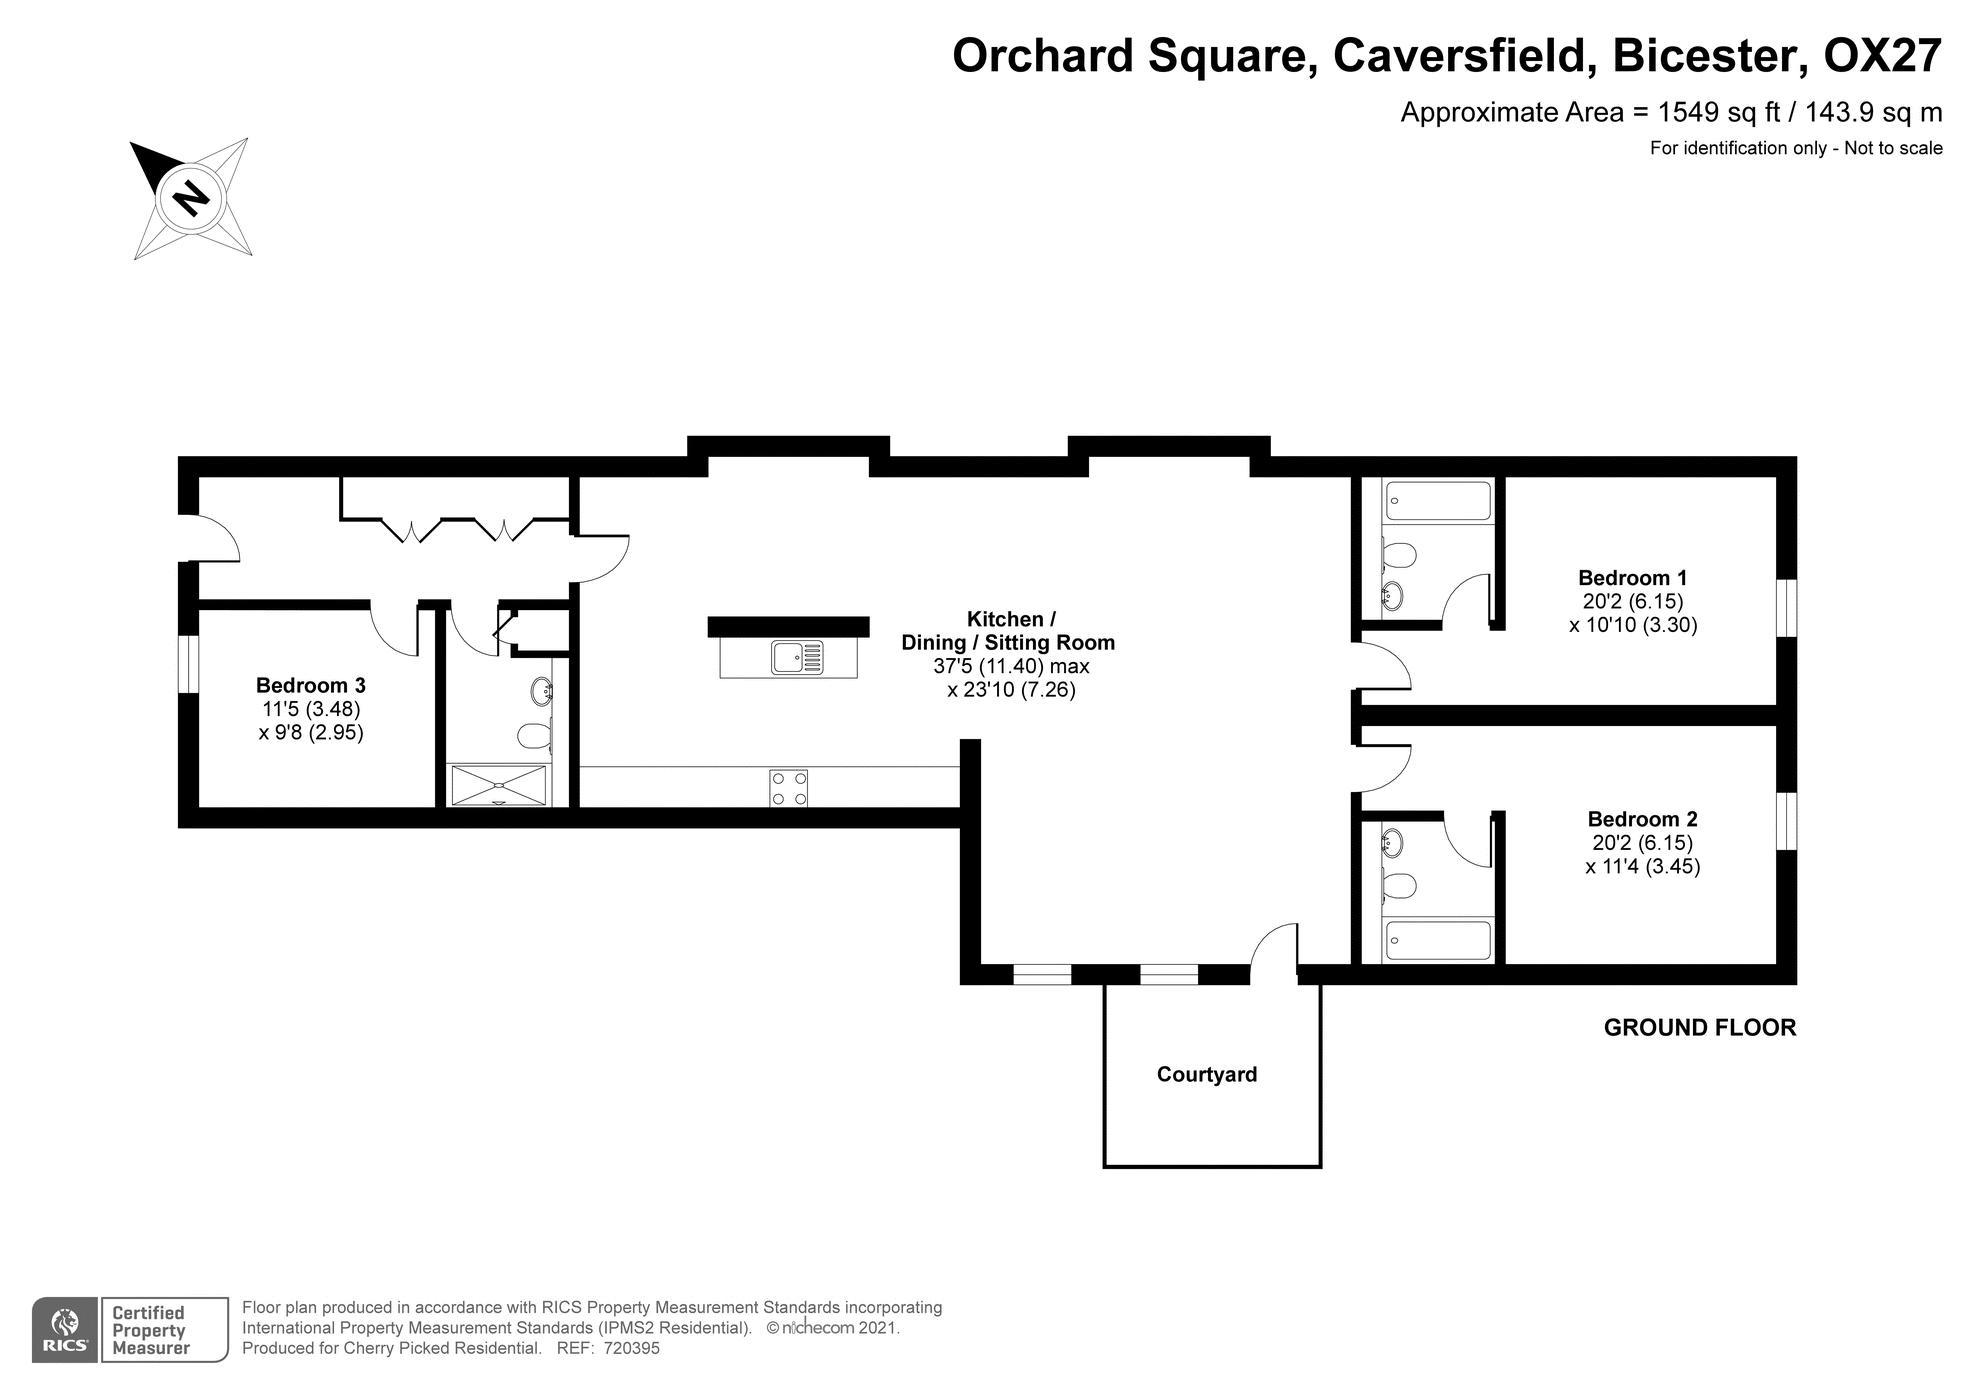 Orchard Square Caversfield